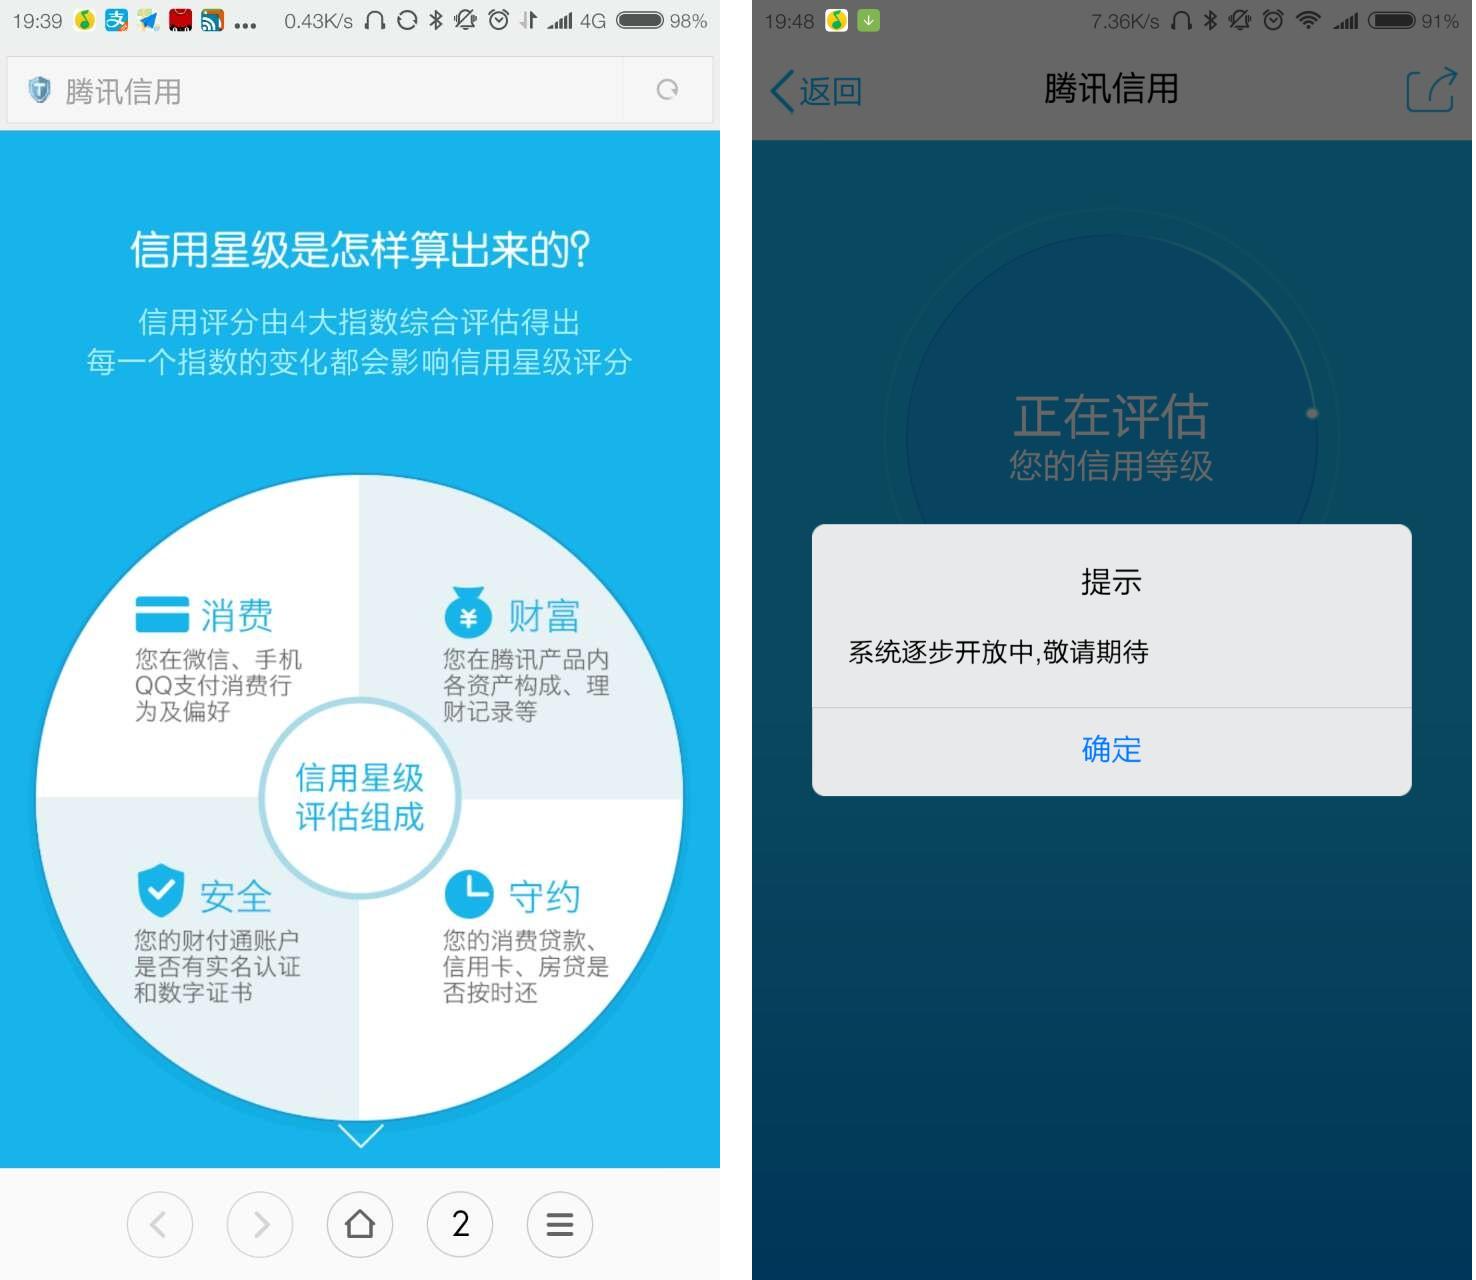 tencent_service